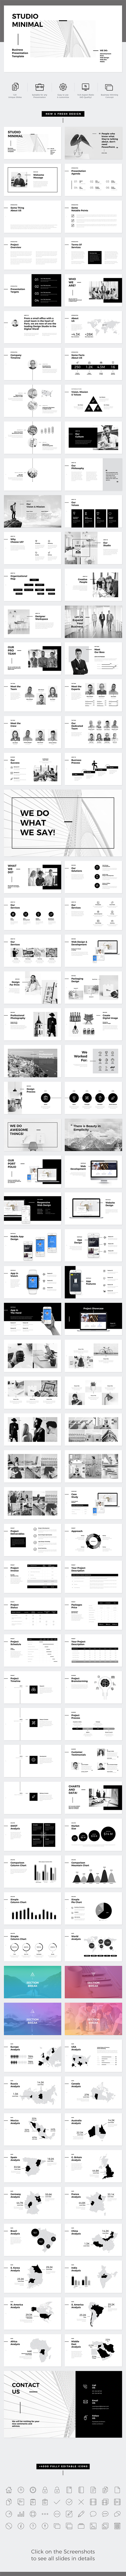 Studio Minimal Presentation Google Slides Template - Google Slides Presentation Templates